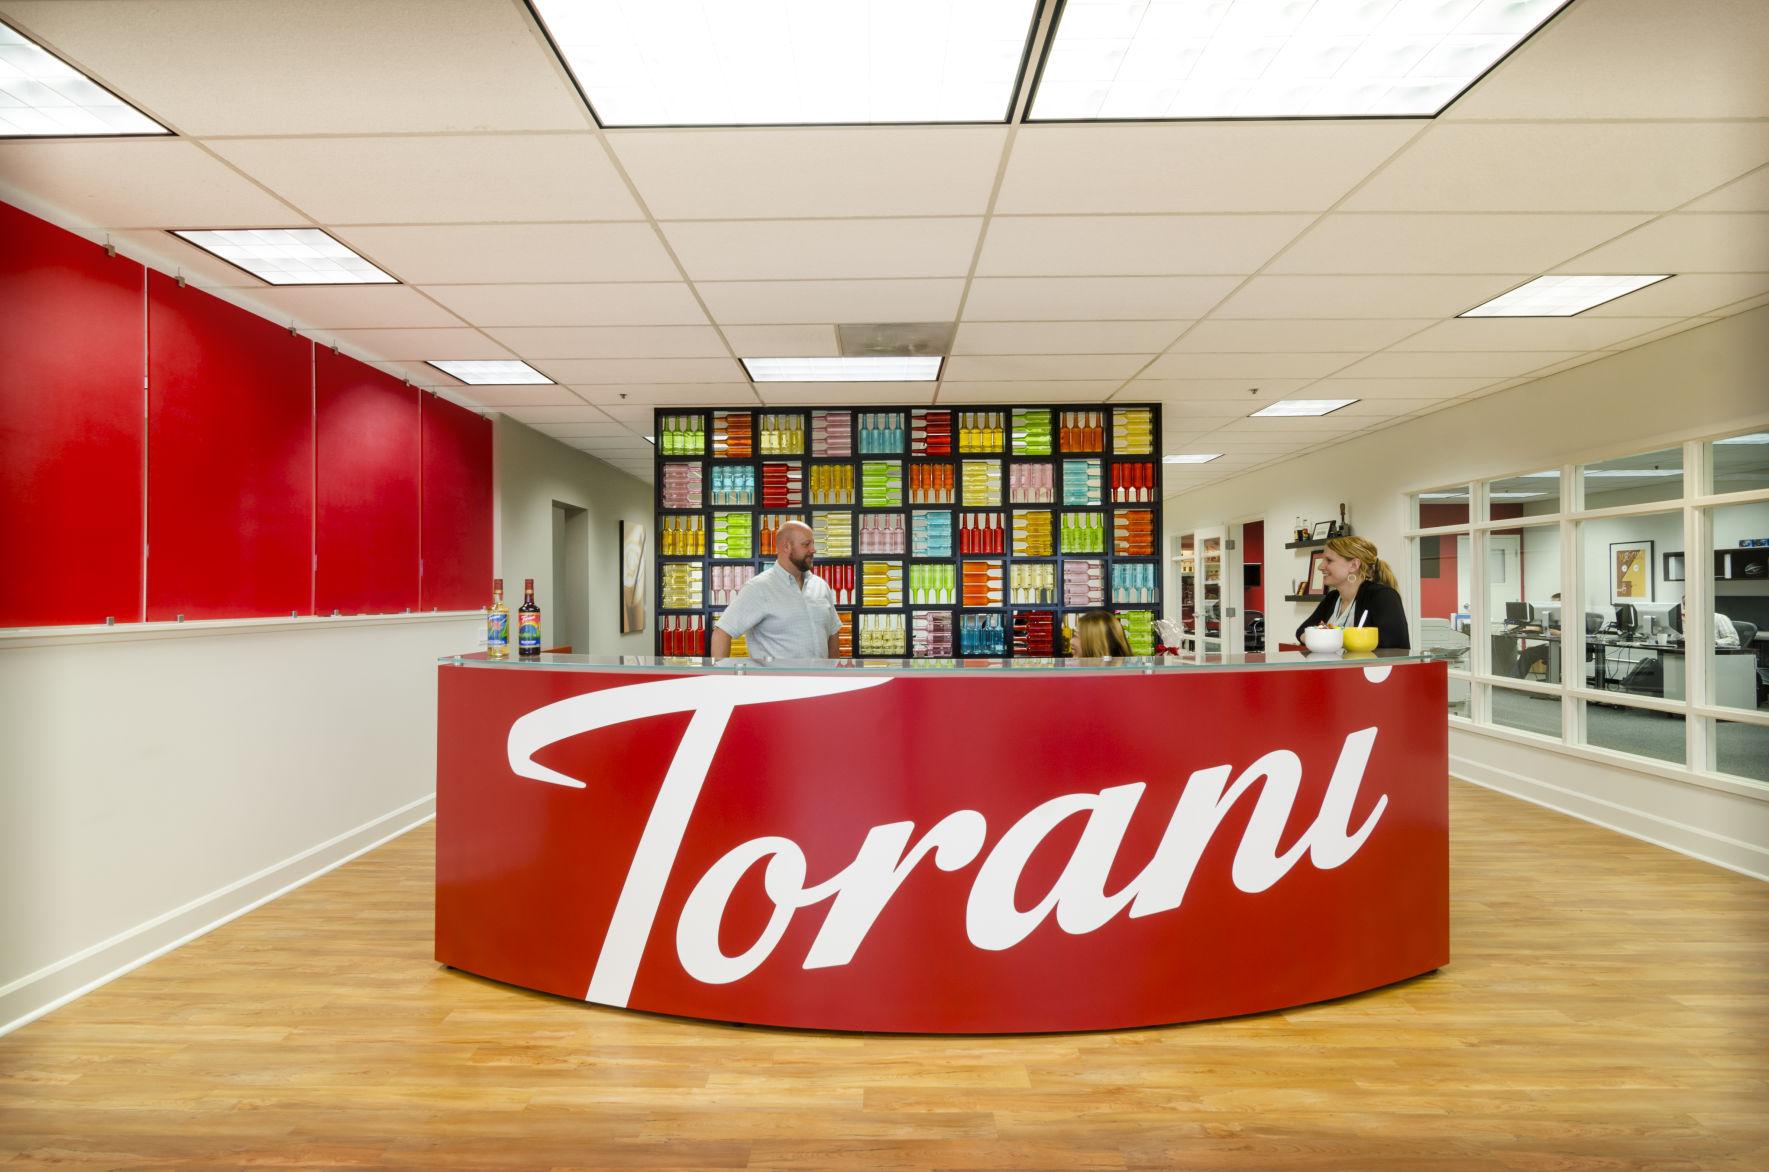 A bittersweet goodbye: South Cityu0027s famous Torani Syrups set to move